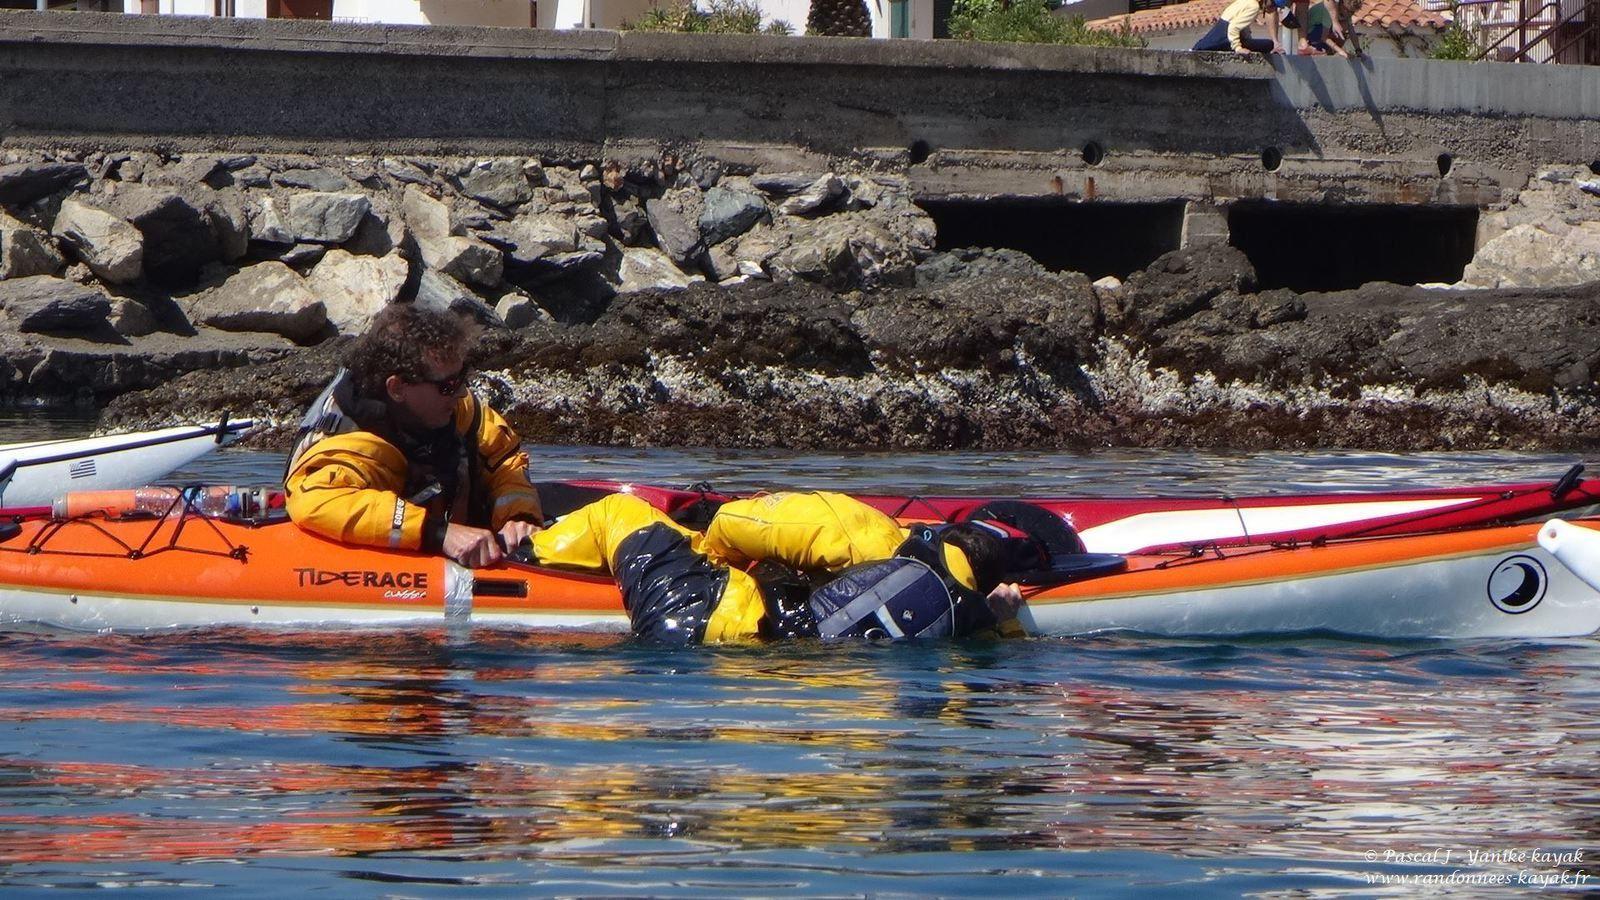 Pagaia 2017 : VIIème symposium international de kayak de mer (1/2)